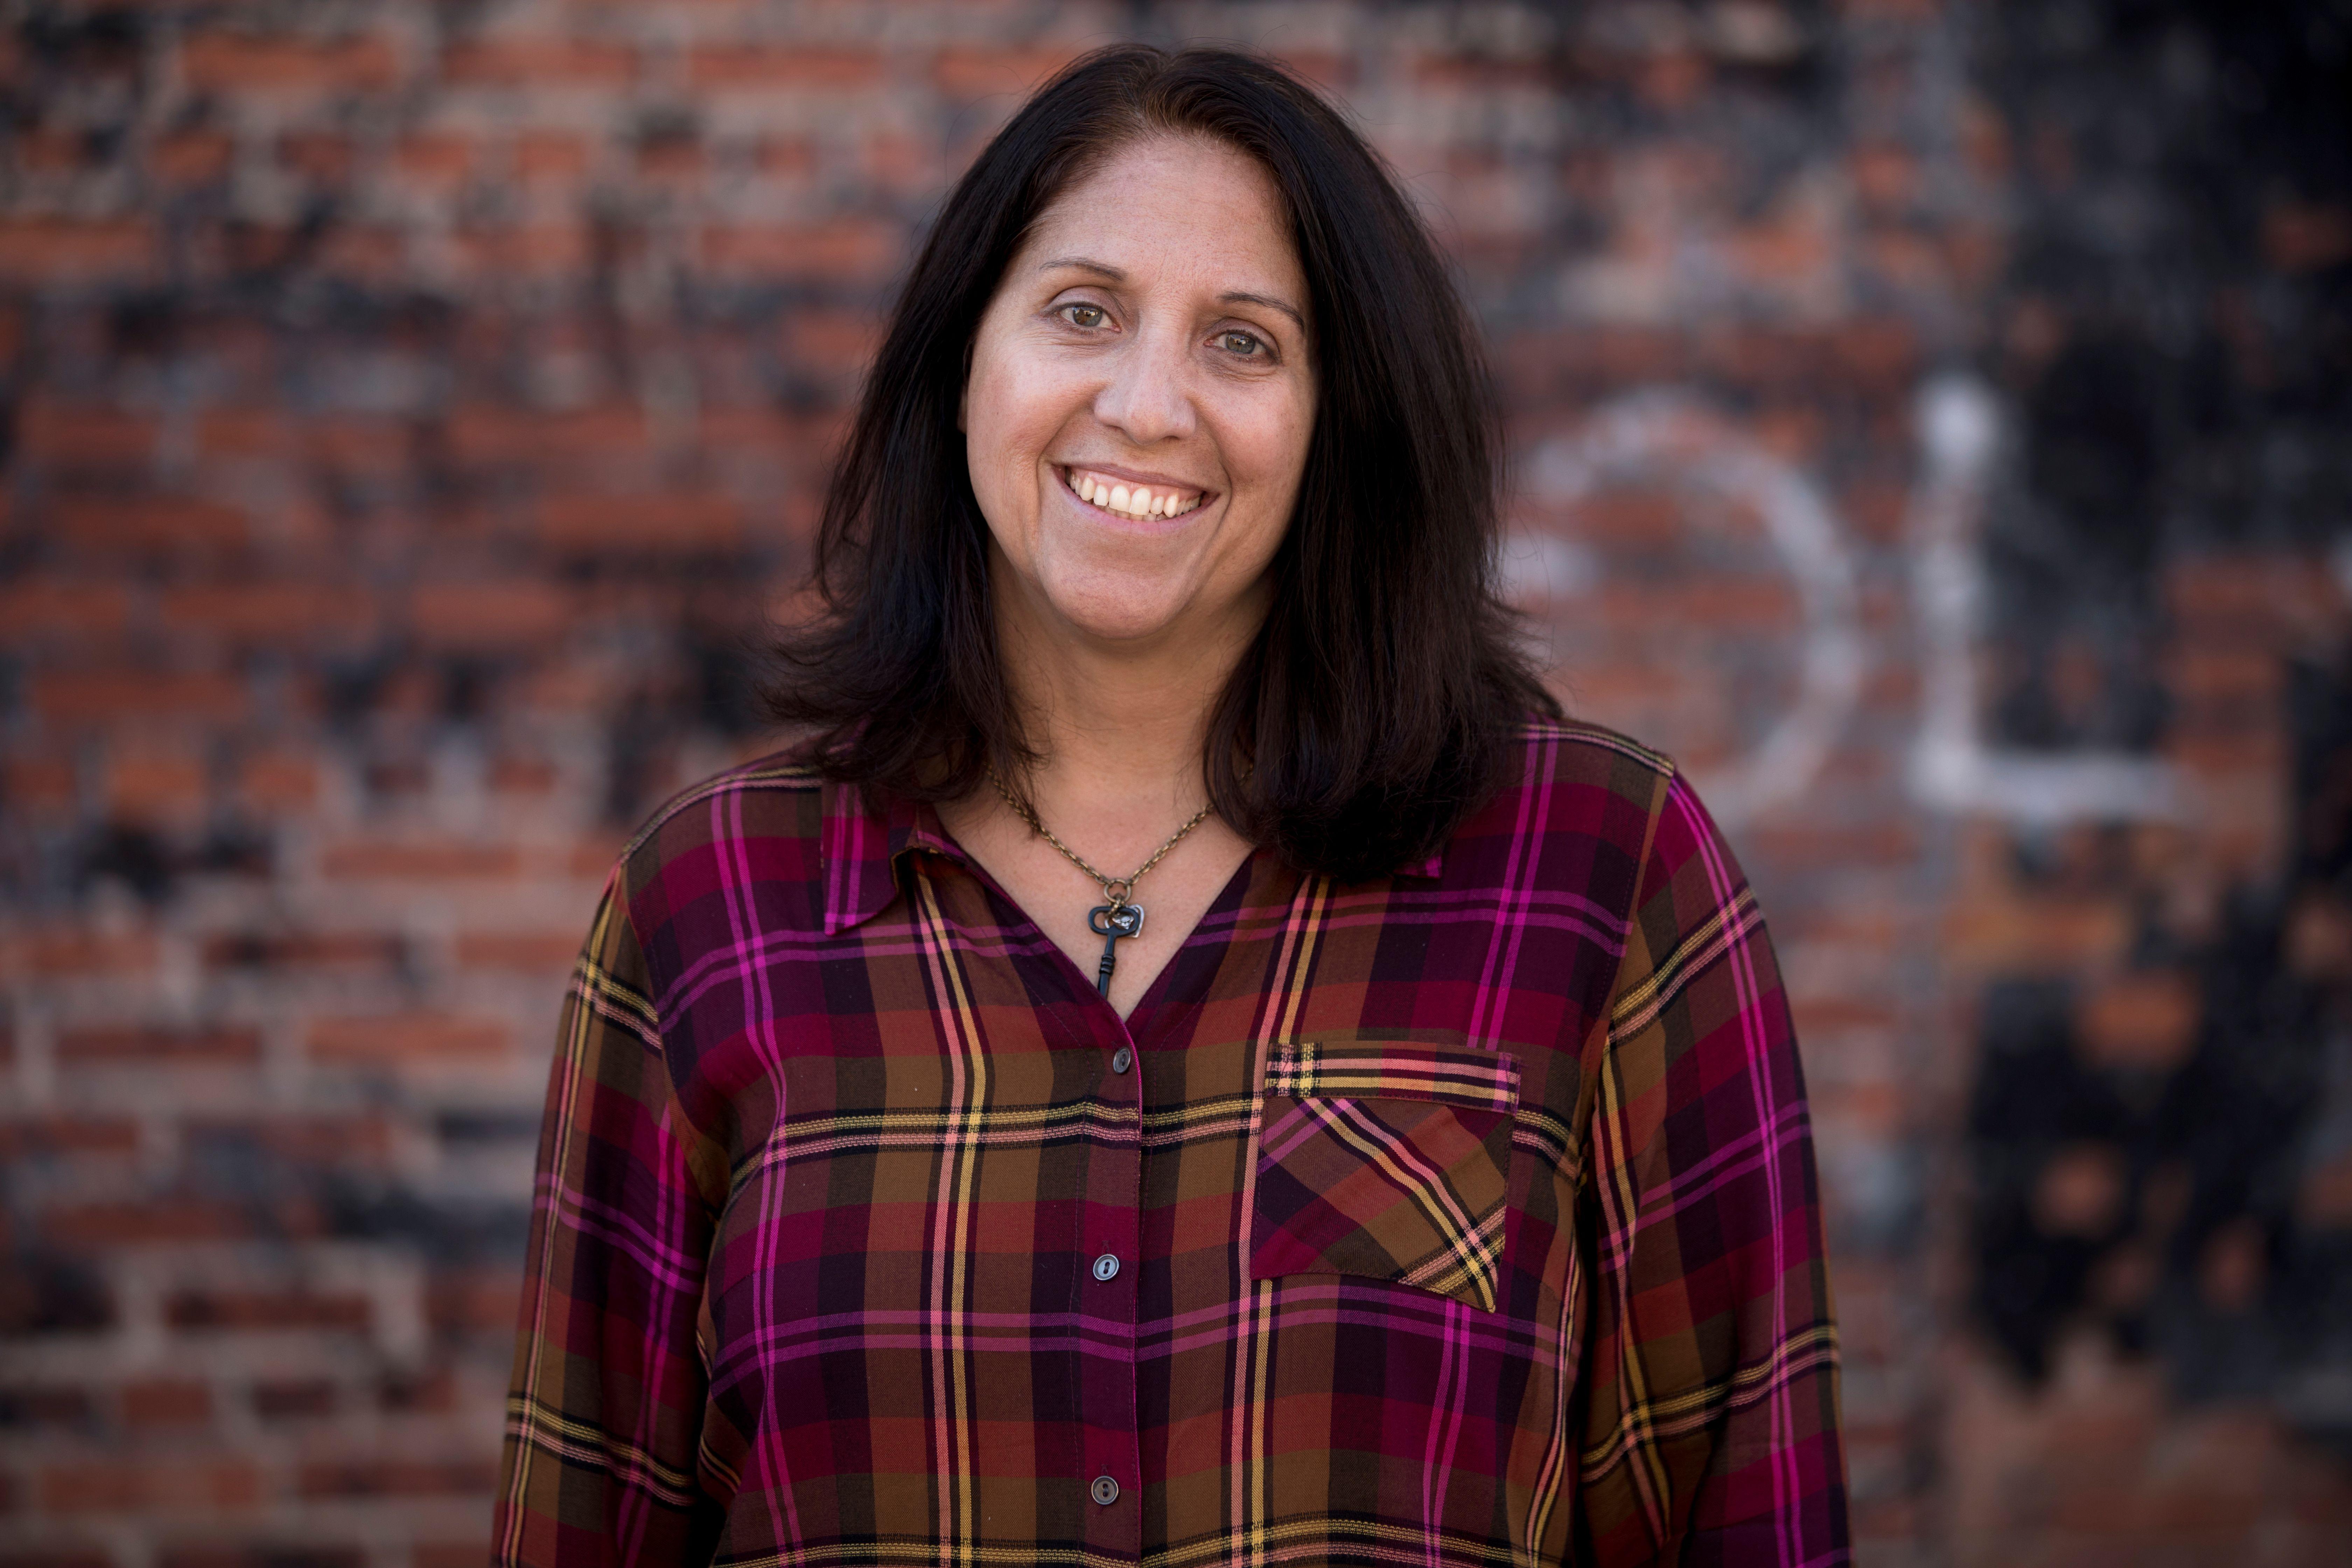 Kristie Hewitt